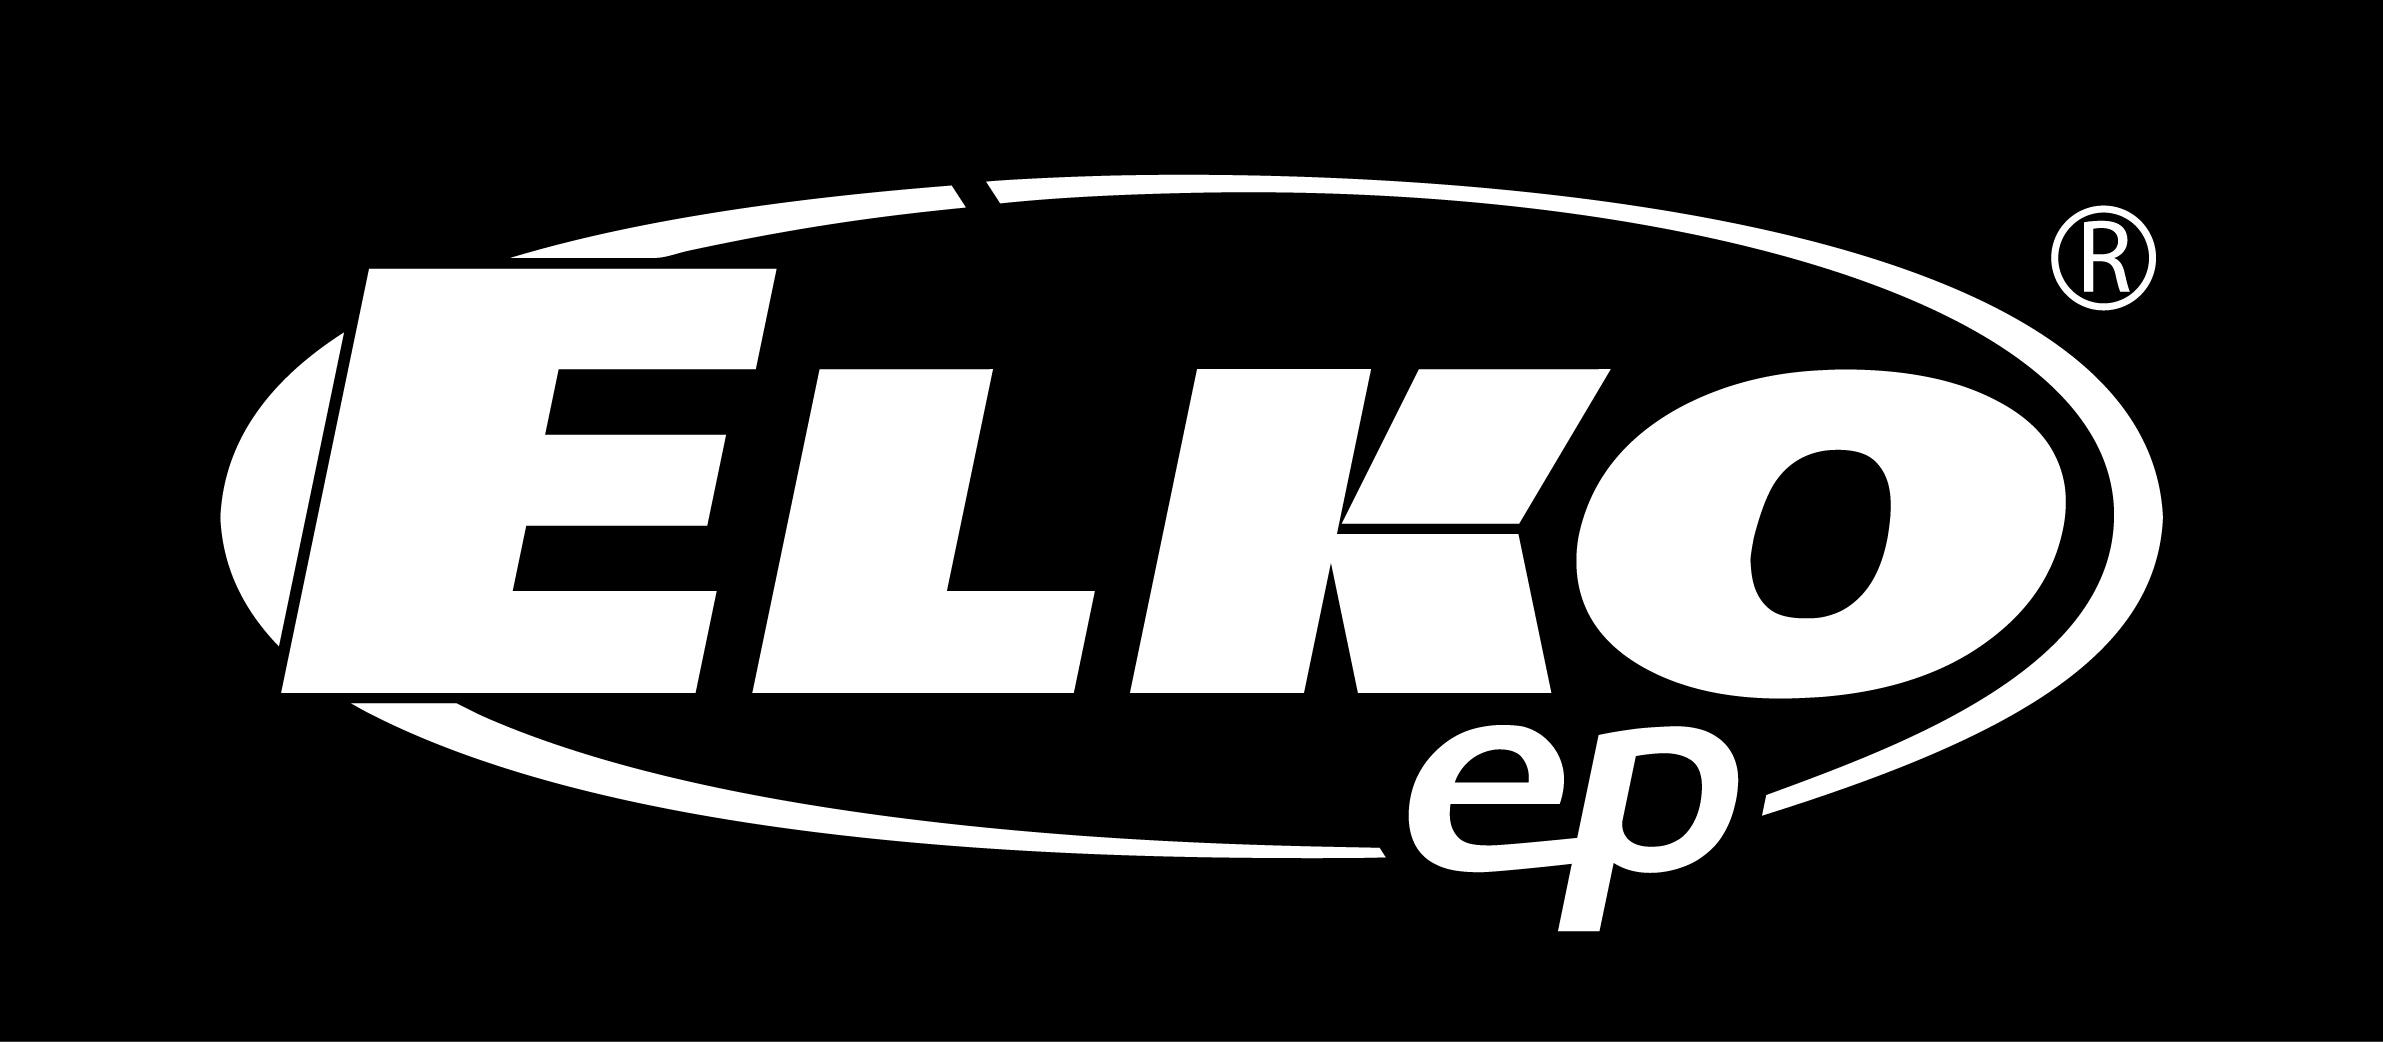 Marketing support • ElkoEP.